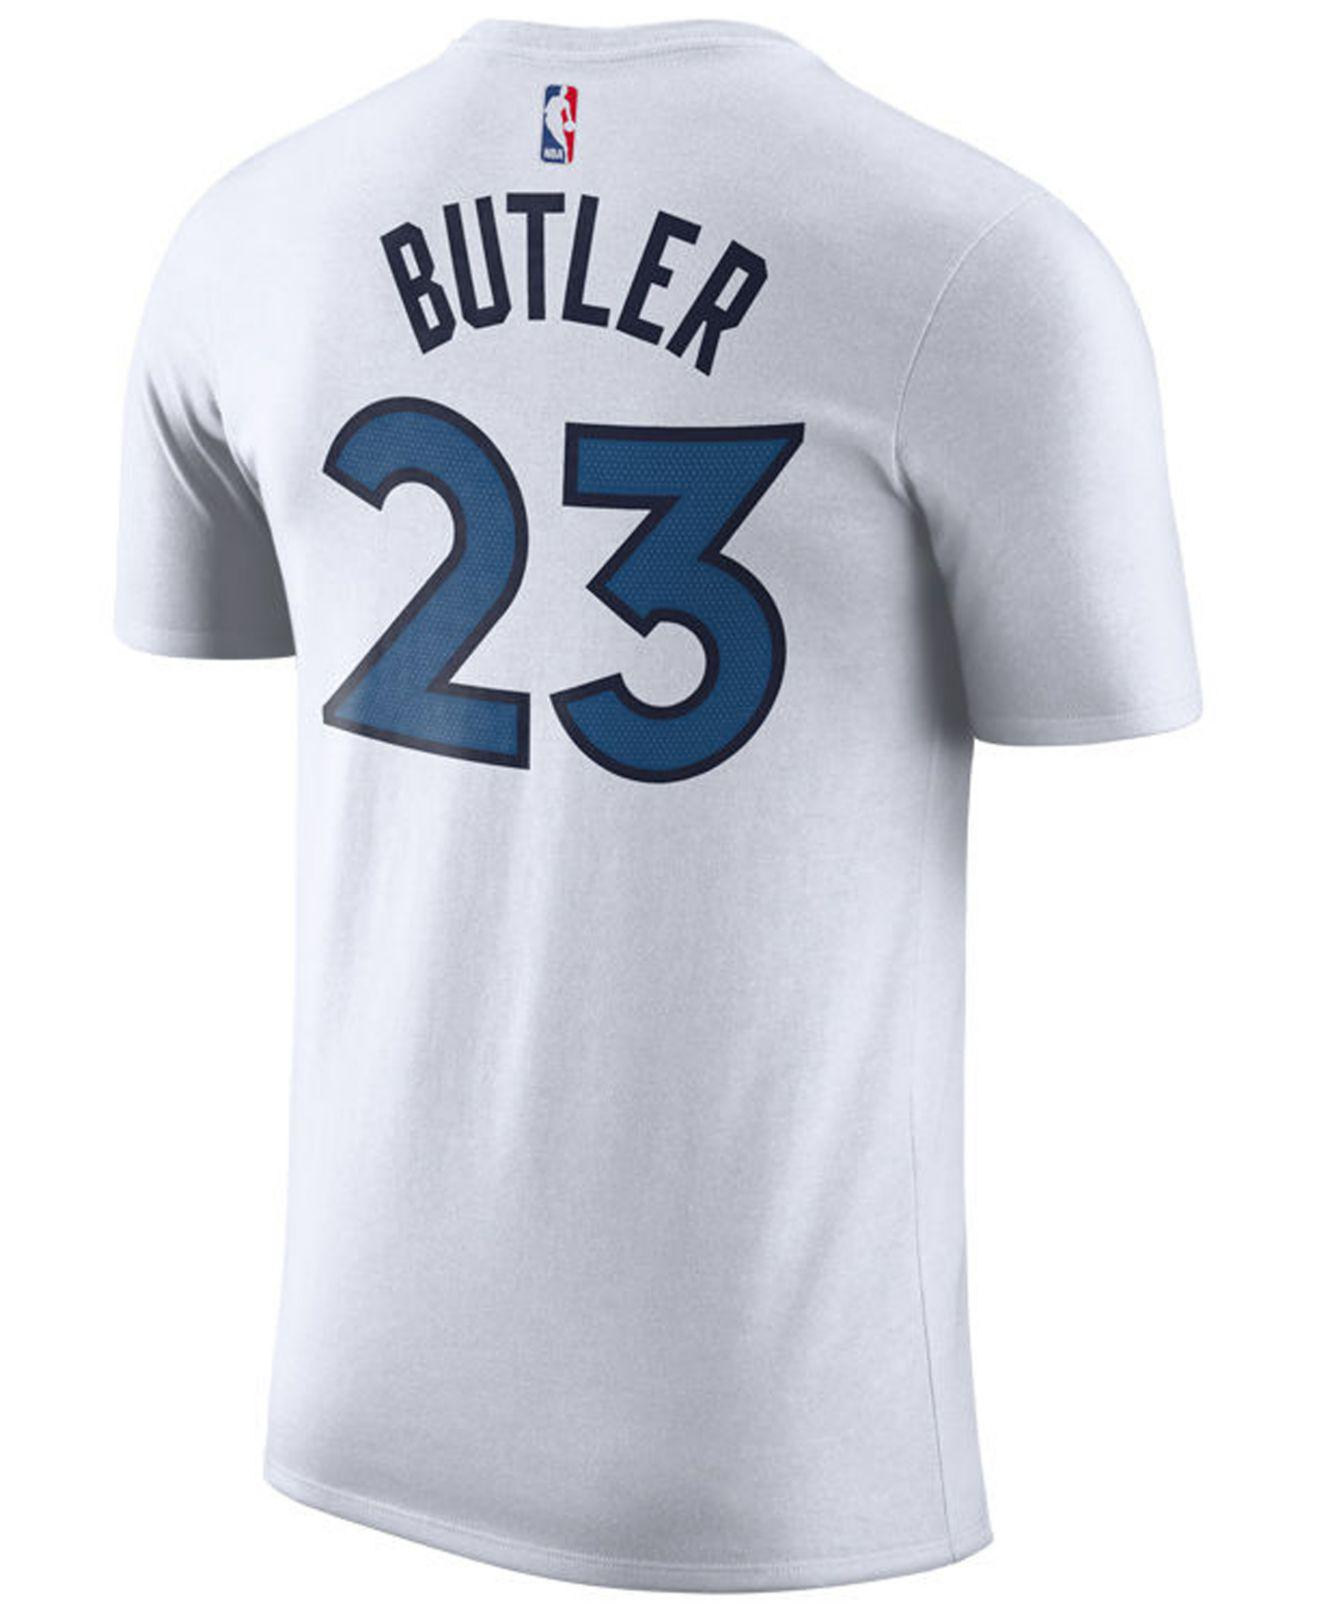 b3c871c48 Nike. Men s White Jimmy Butler Minnesota Timberwolves Association Player T- shirt